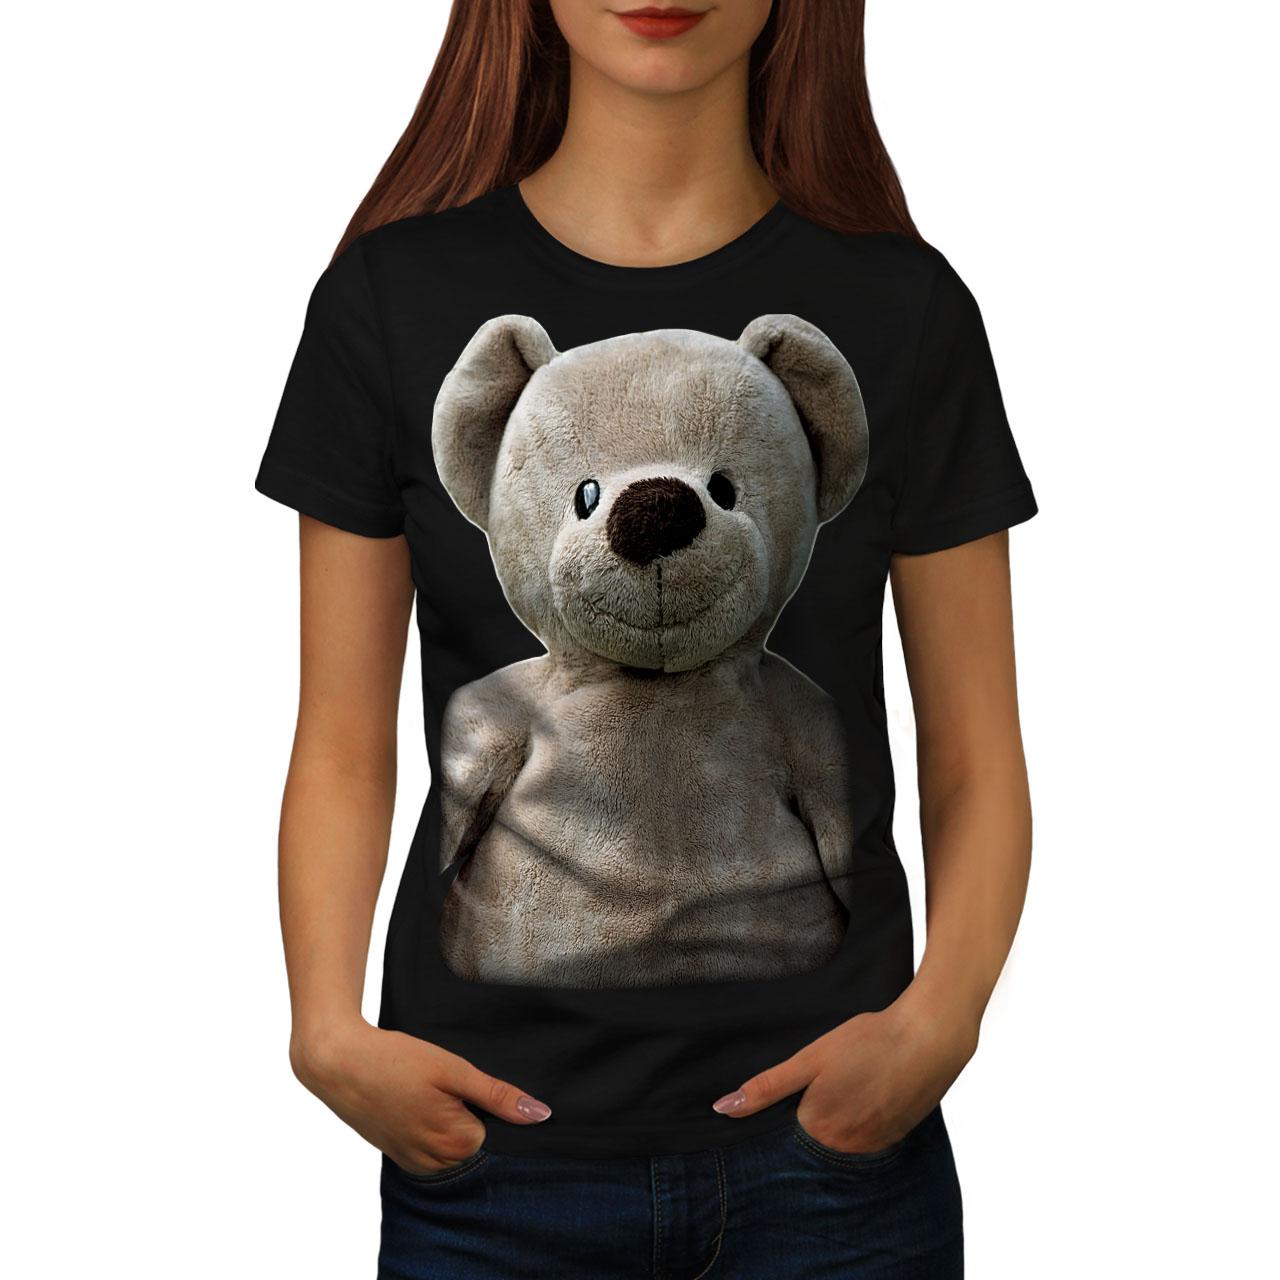 miniature 3 - Wellcoda Cute Plush Womens T-shirt, Teddy Bear Casual Design Printed Tee